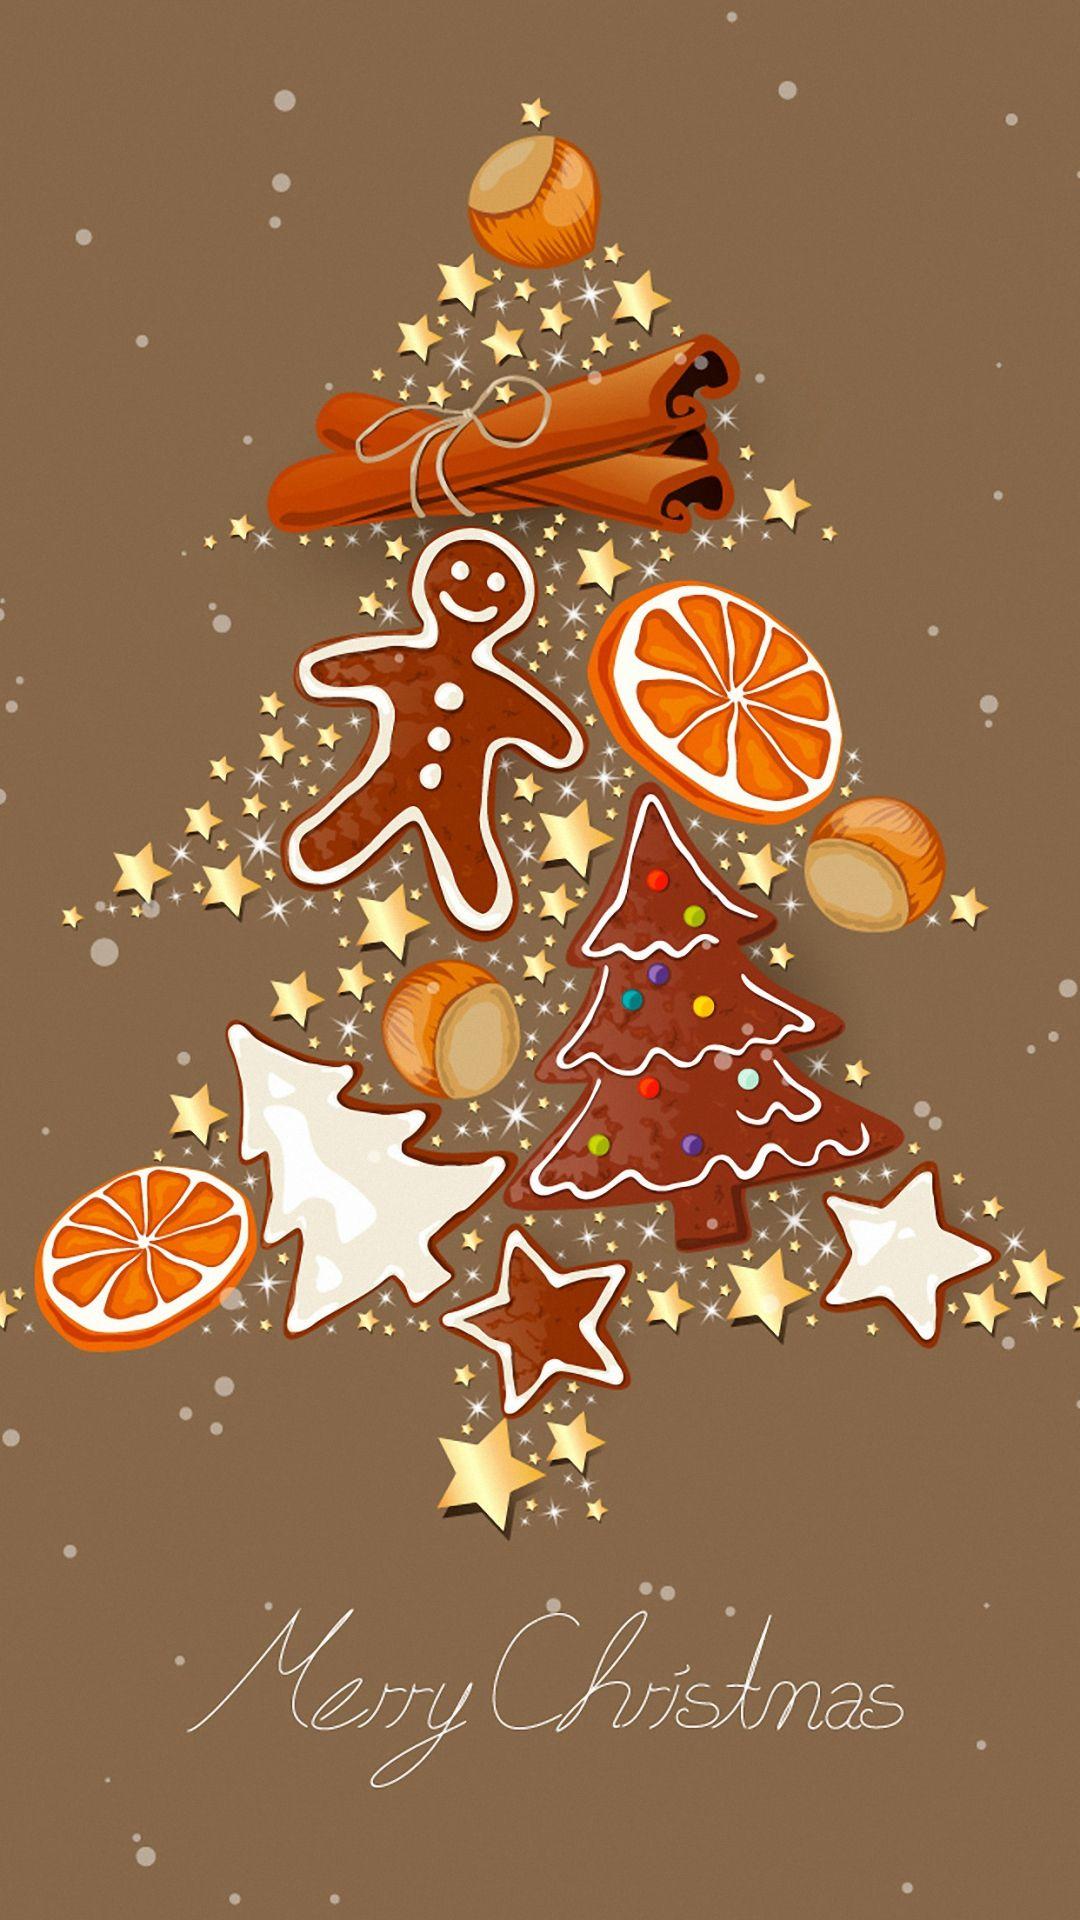 Iphone 6s Wallpaper Hd 1080x1920 Wallpaper Iphone Christmas Merry Christmas Wallpaper Cute Christmas Wallpaper